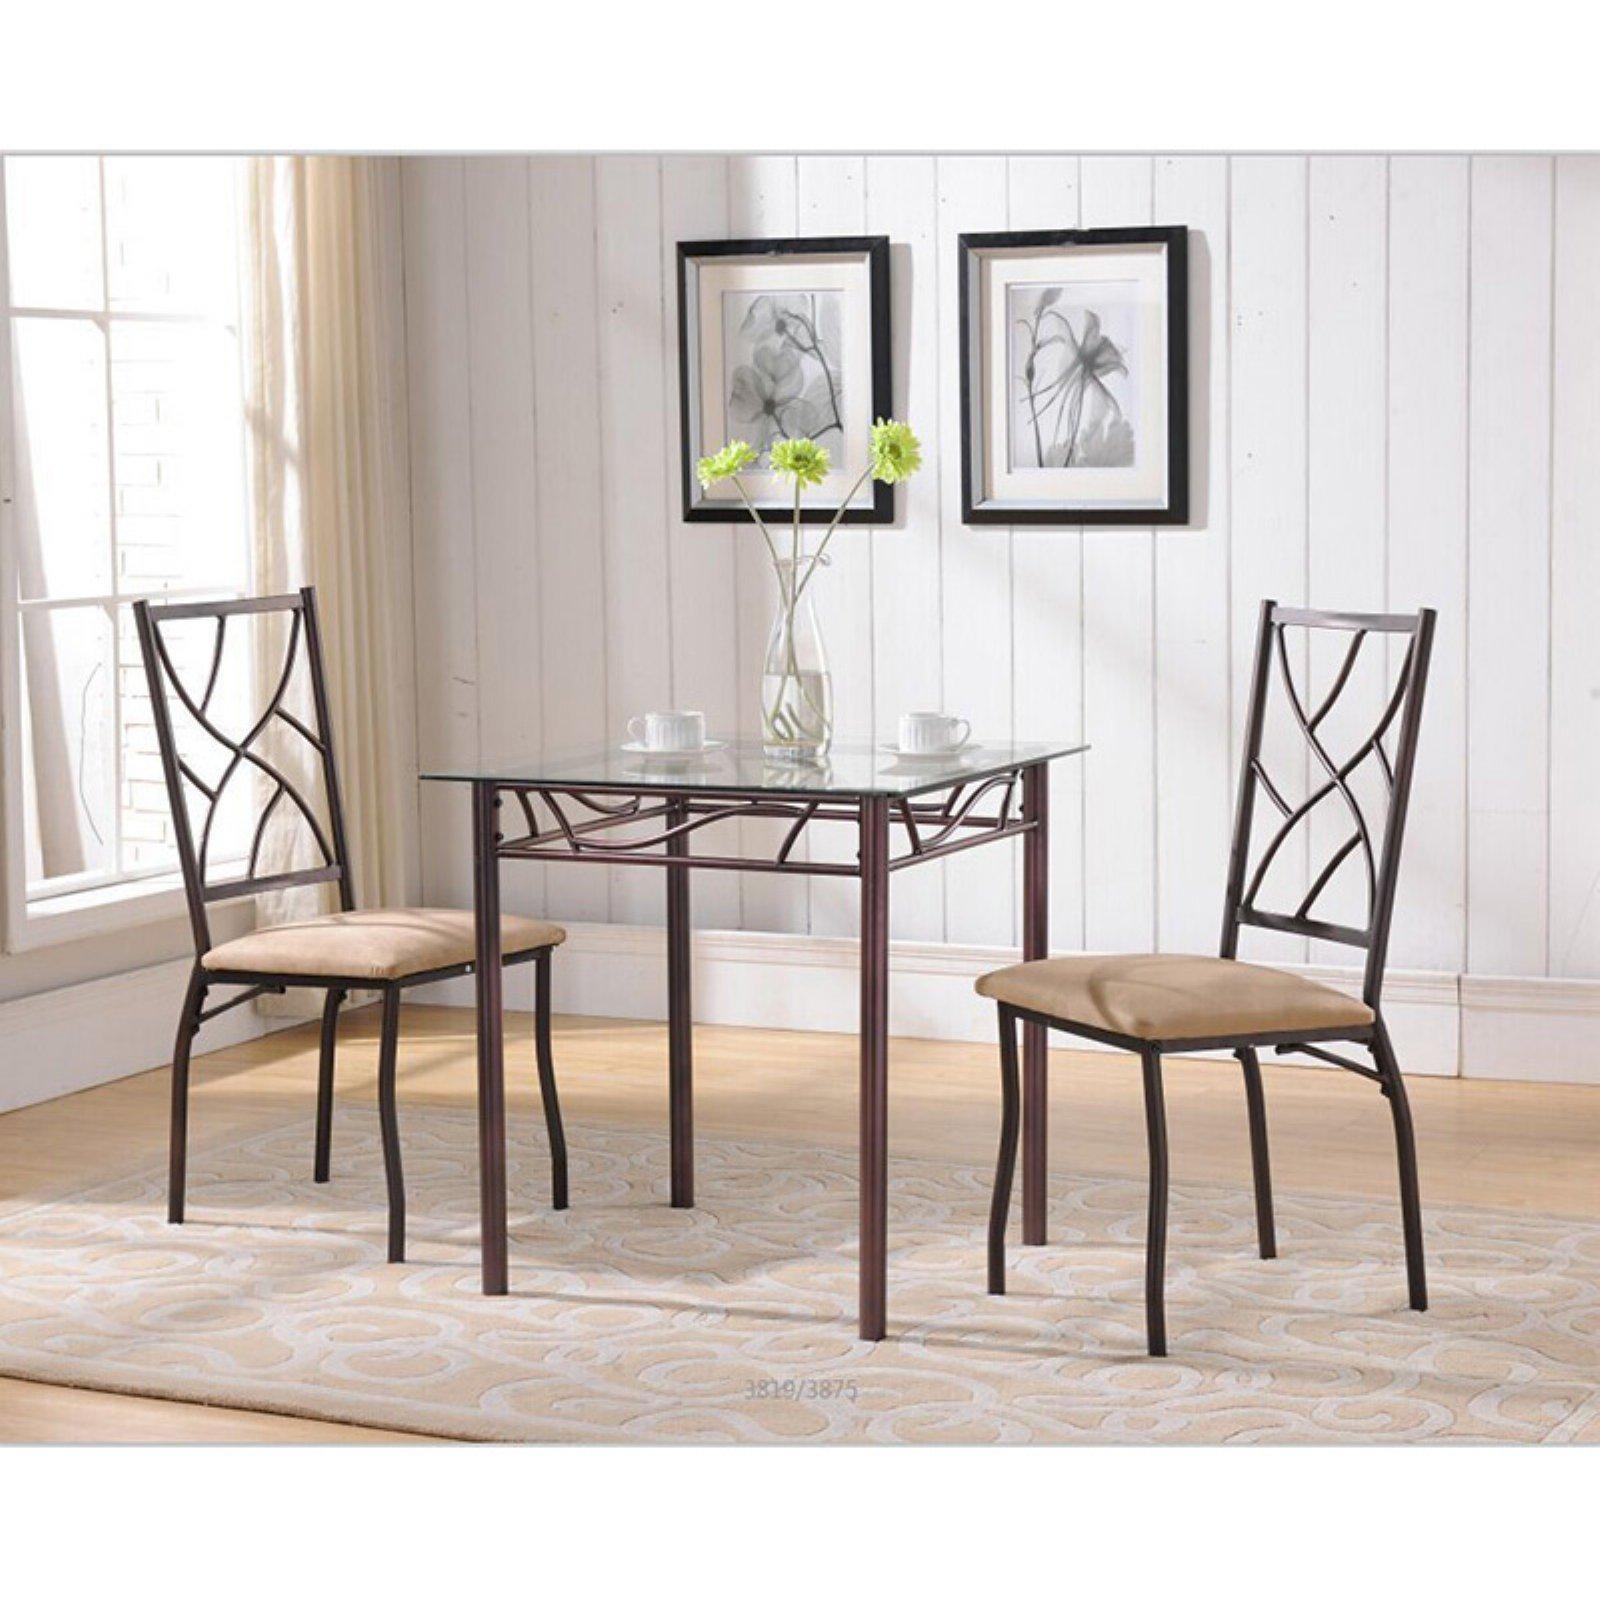 K&B Furniture Bronze Metal Glass Top Dining Table